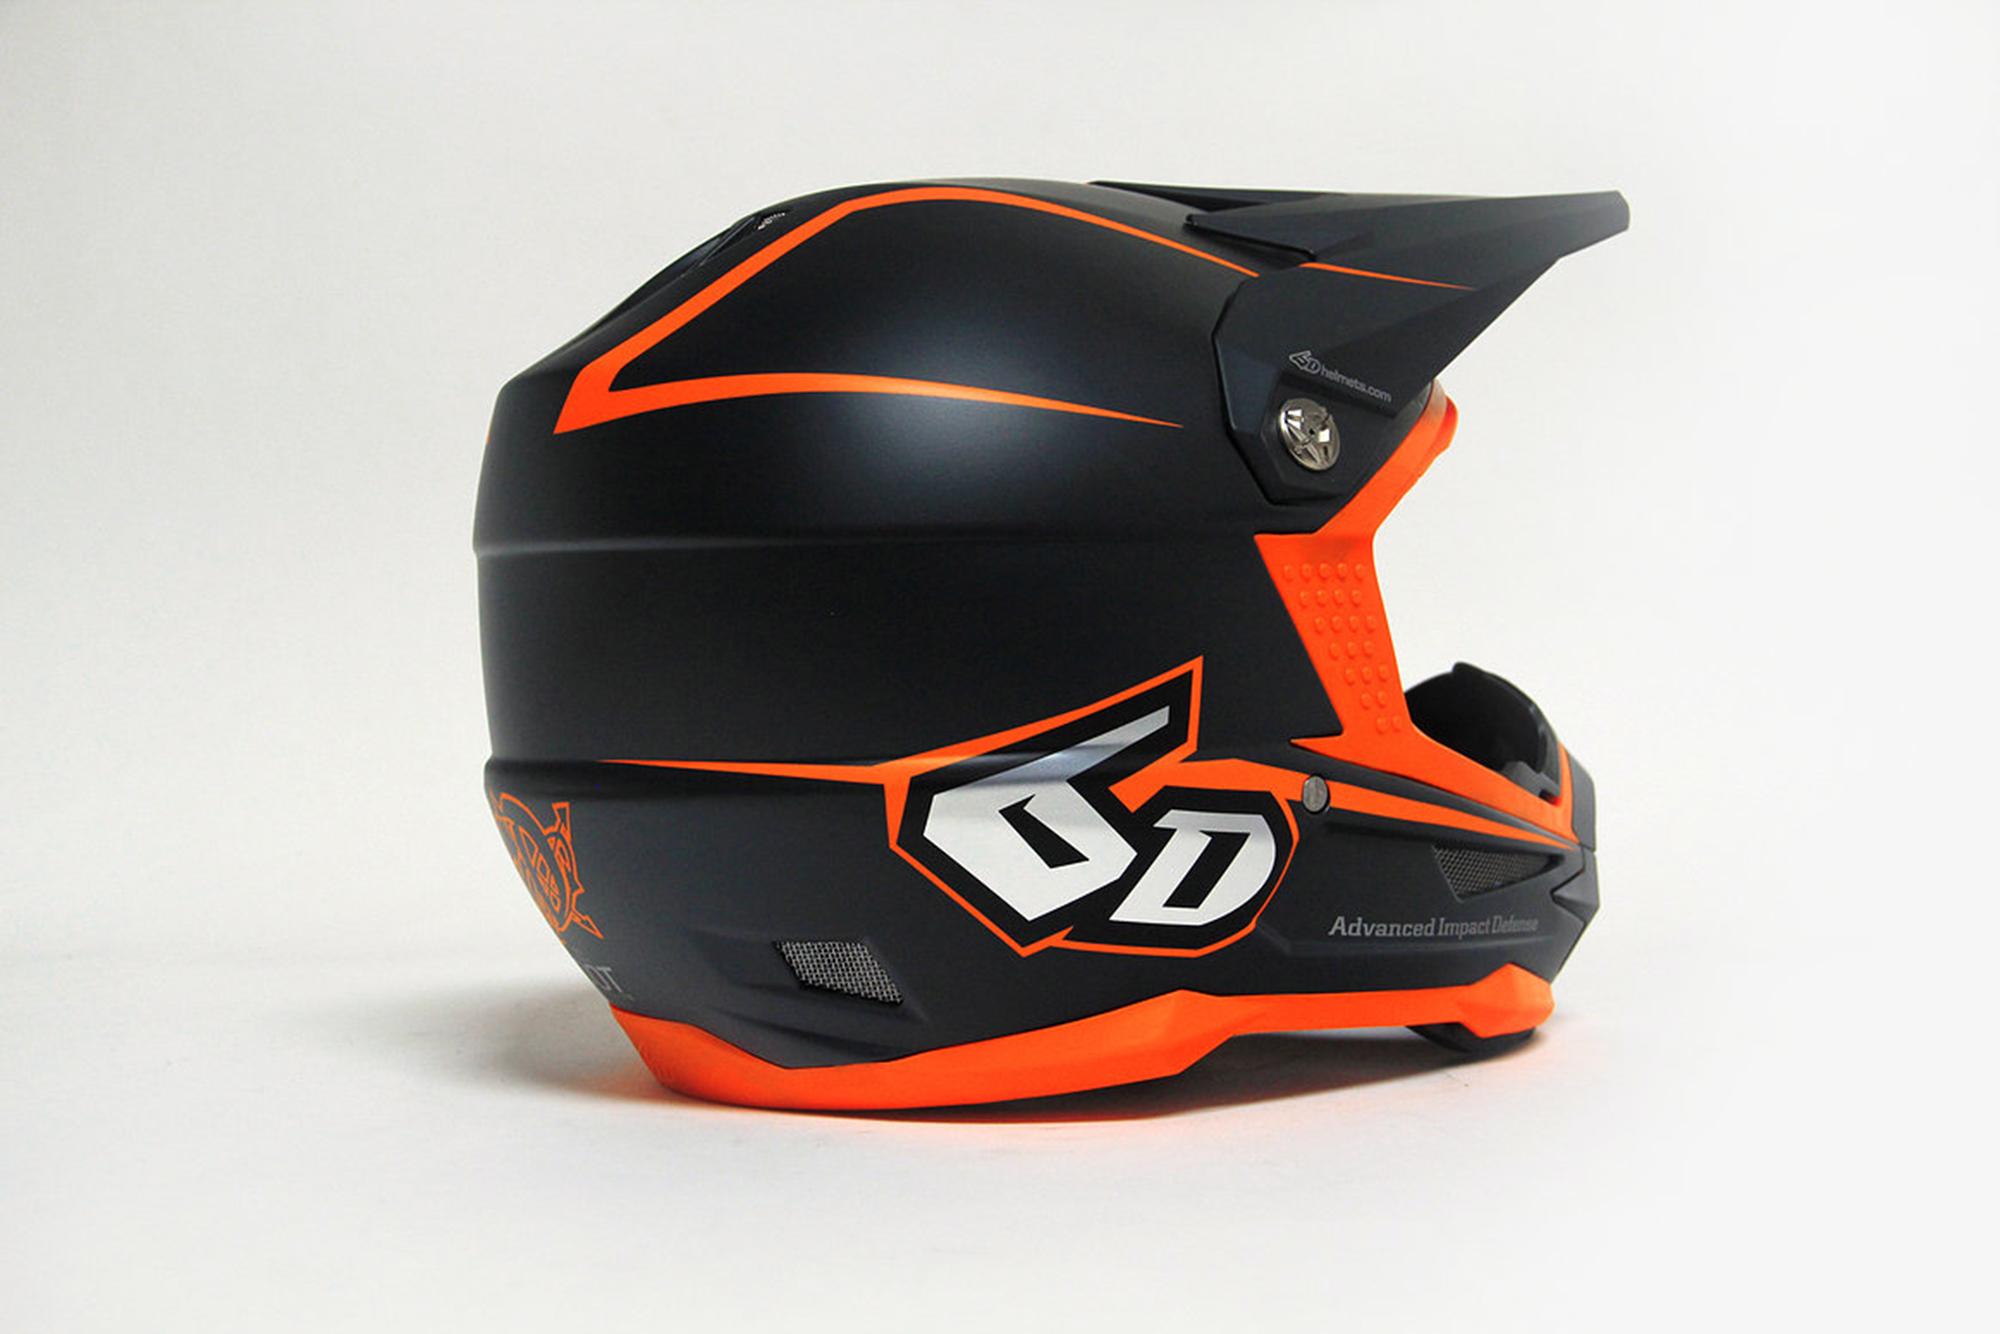 Designapplause Atr 1 6d Helmets